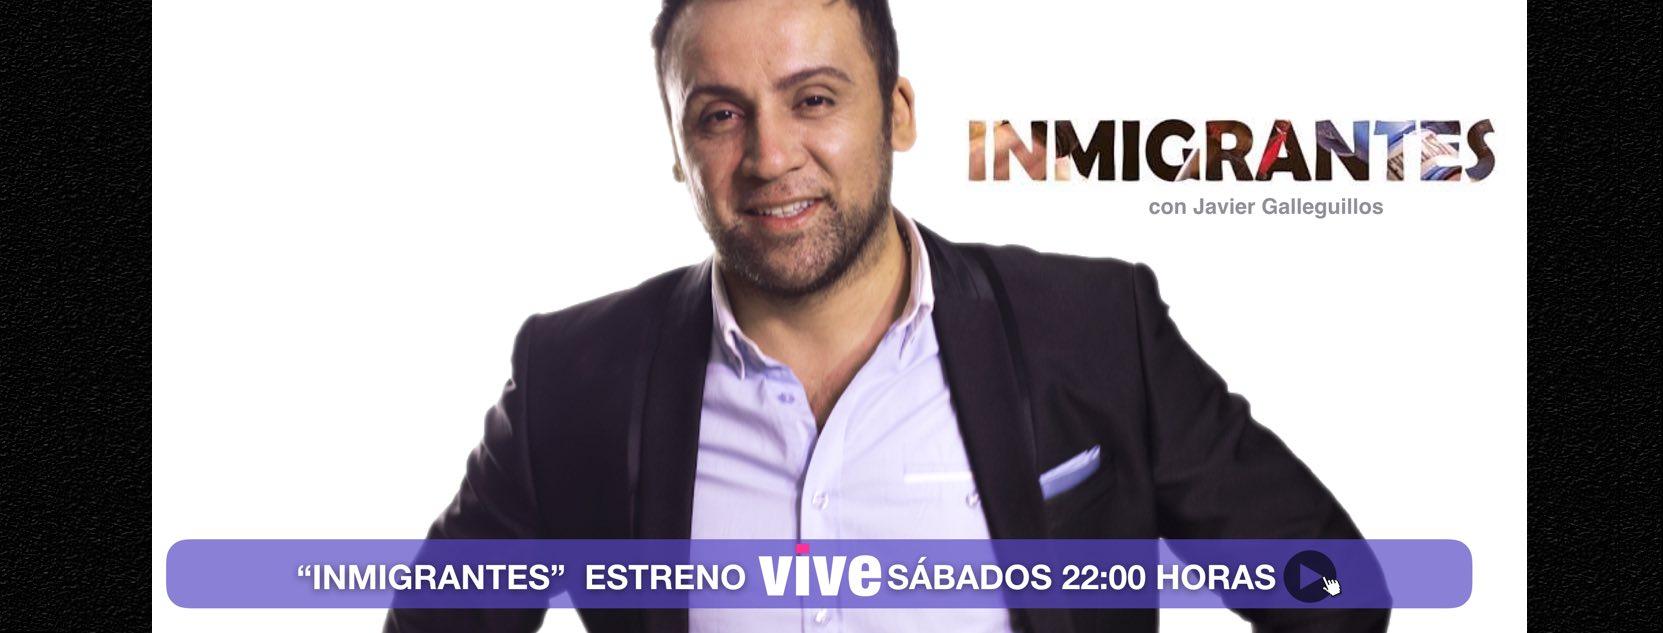 inmigrantes-vive1